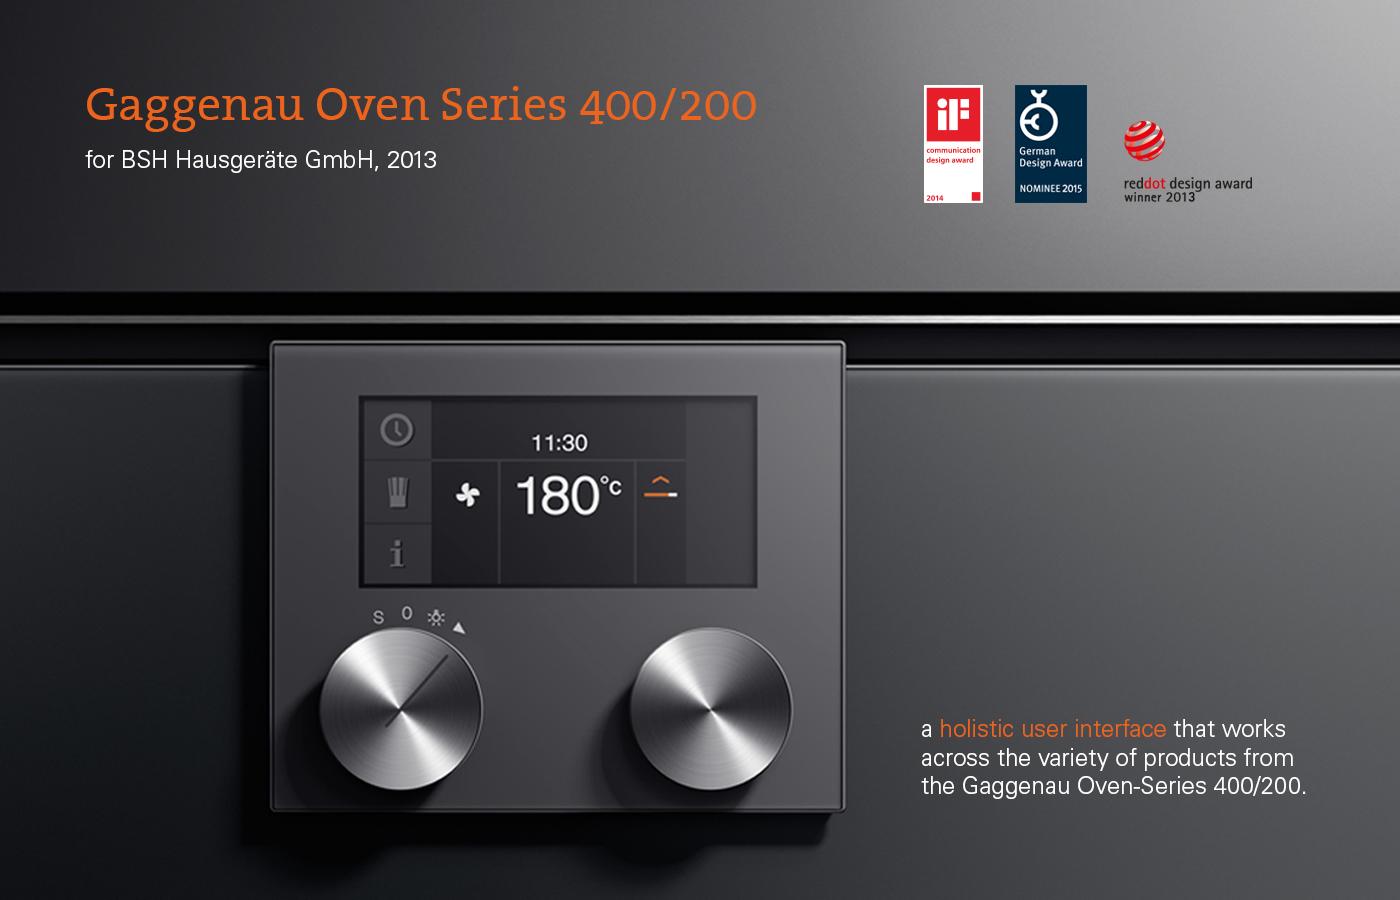 Oven Series Ui For B S H Brand Gaggenau On Behance